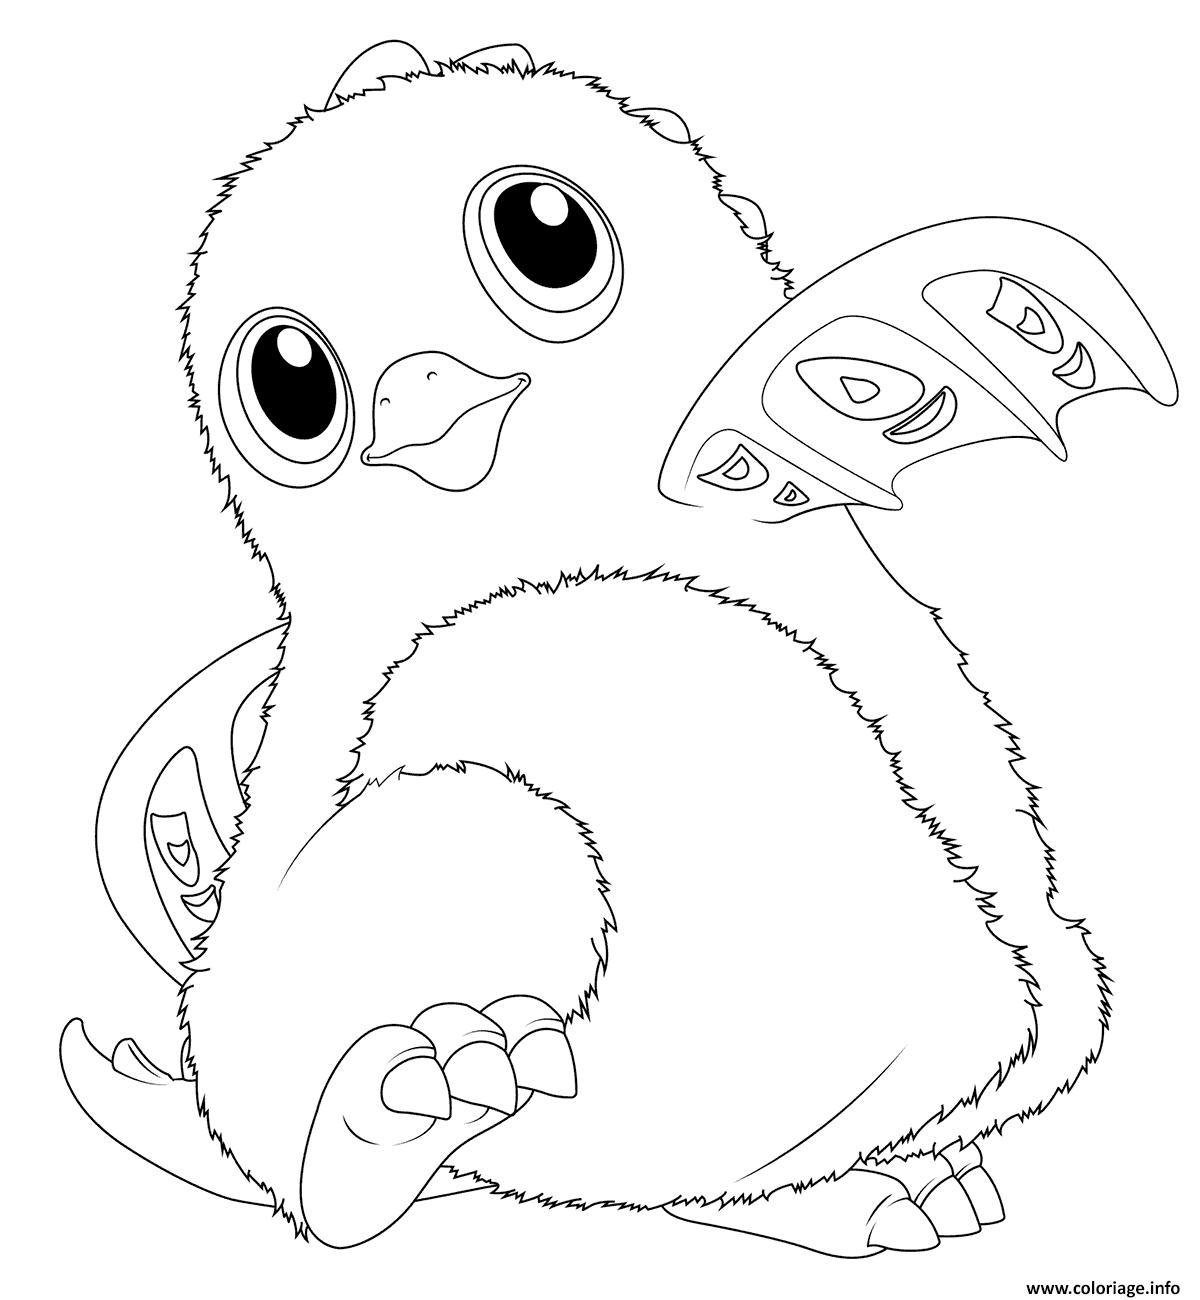 Coloriage Hatchimals Draggles - JeColorie.com